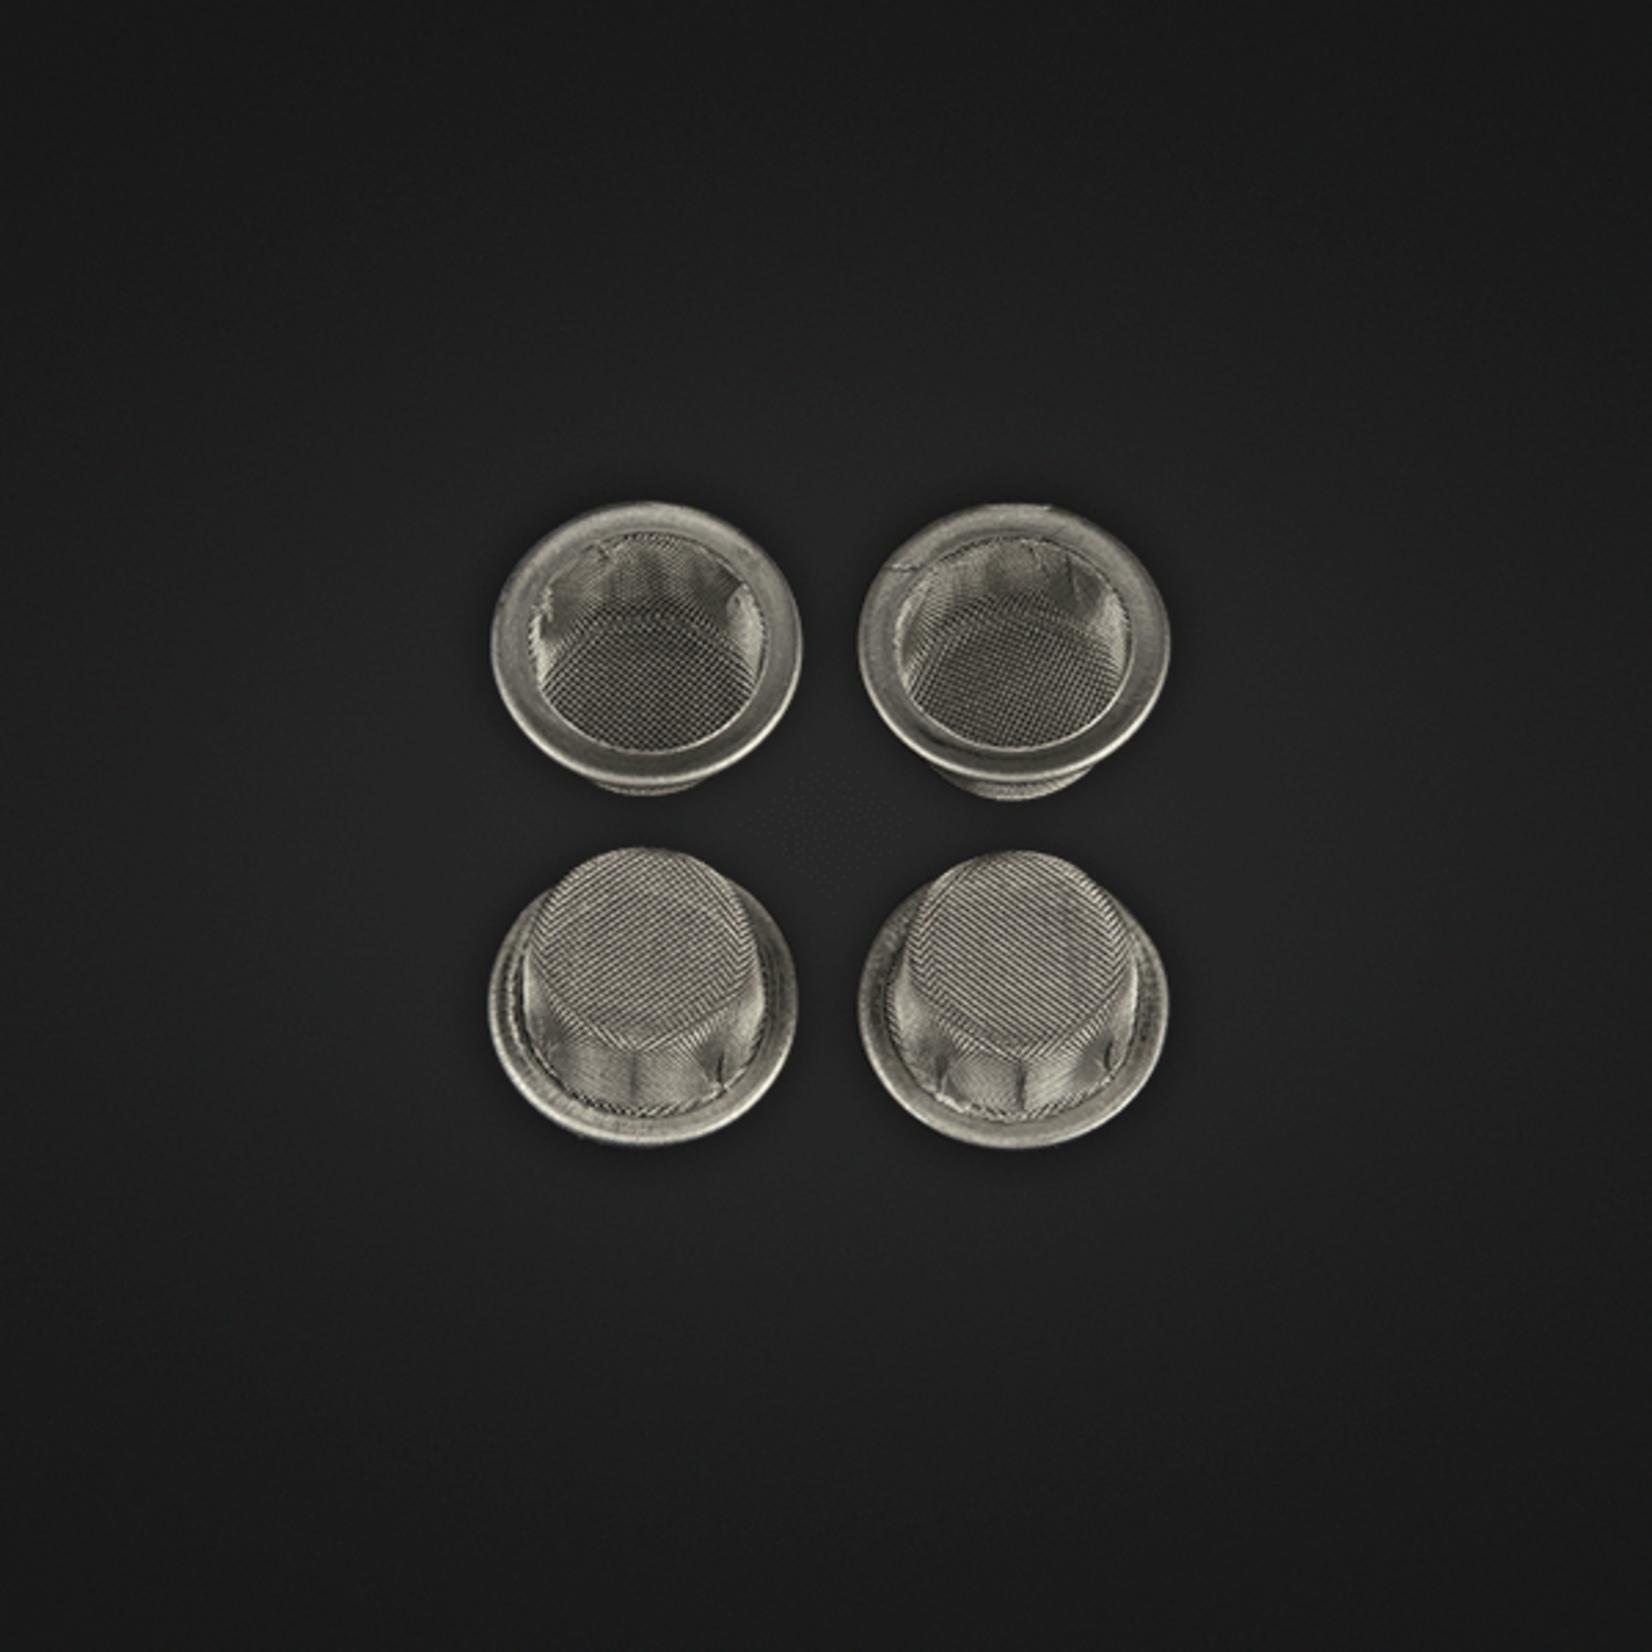 Arizer - Extreme Q Accessories